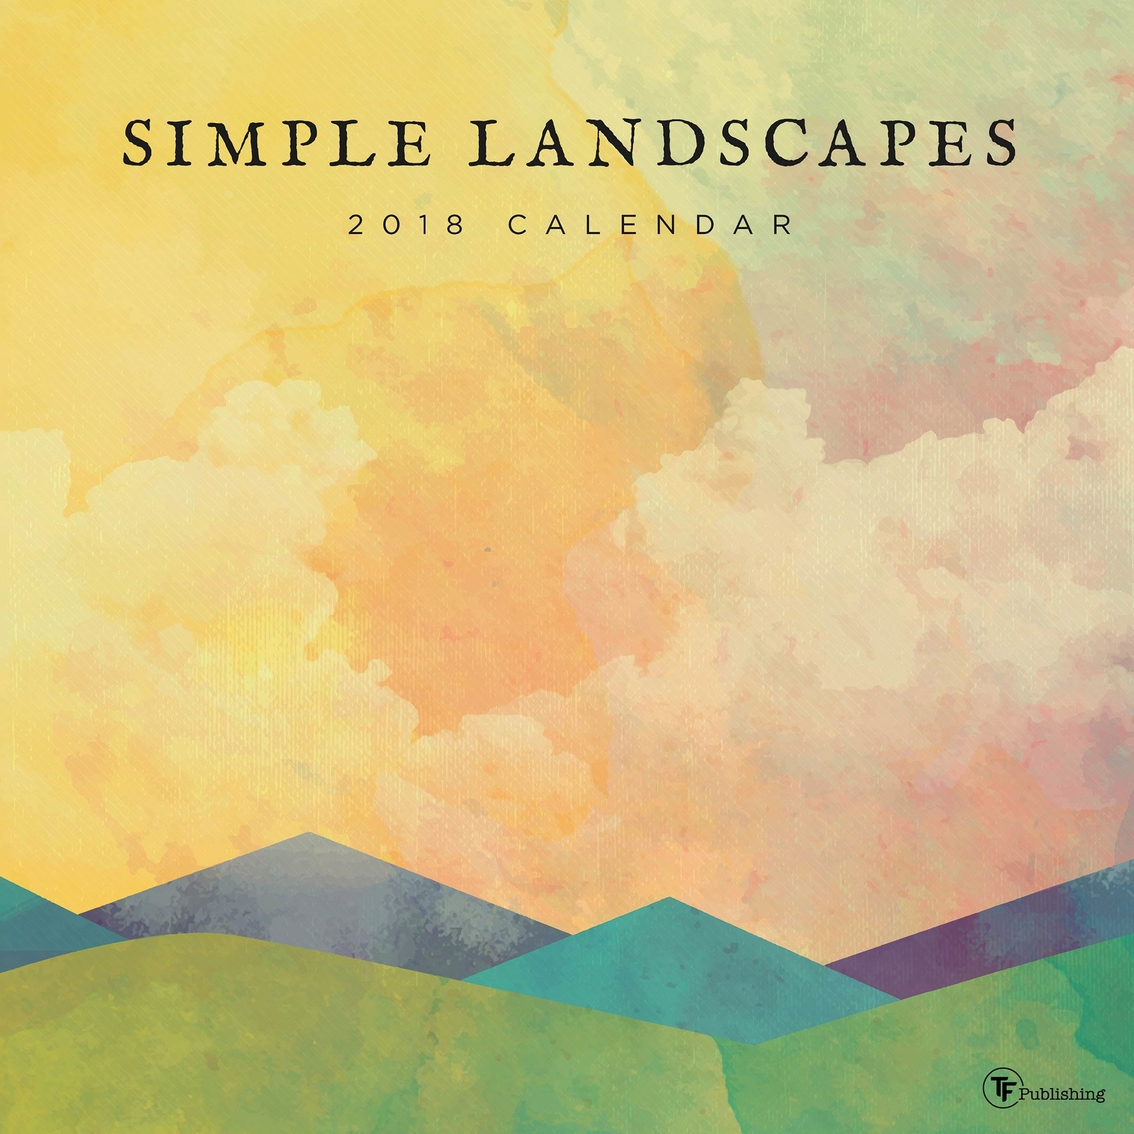 Tf Publishing 2018 Simple Landscapes Wall Calendar | Calendars ...